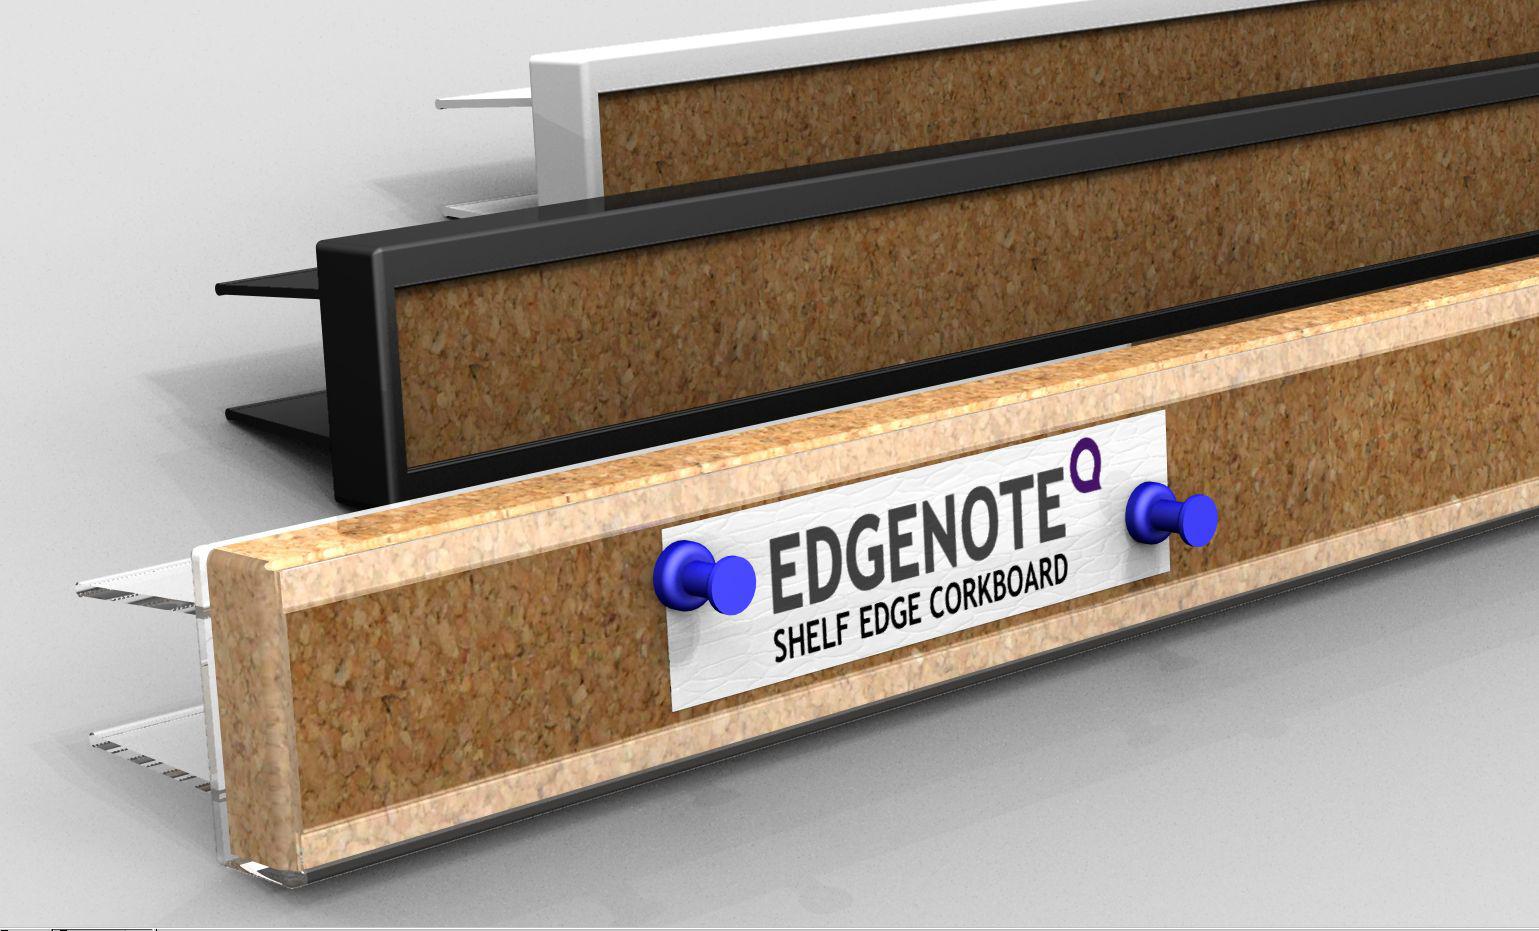 EDGENOTE